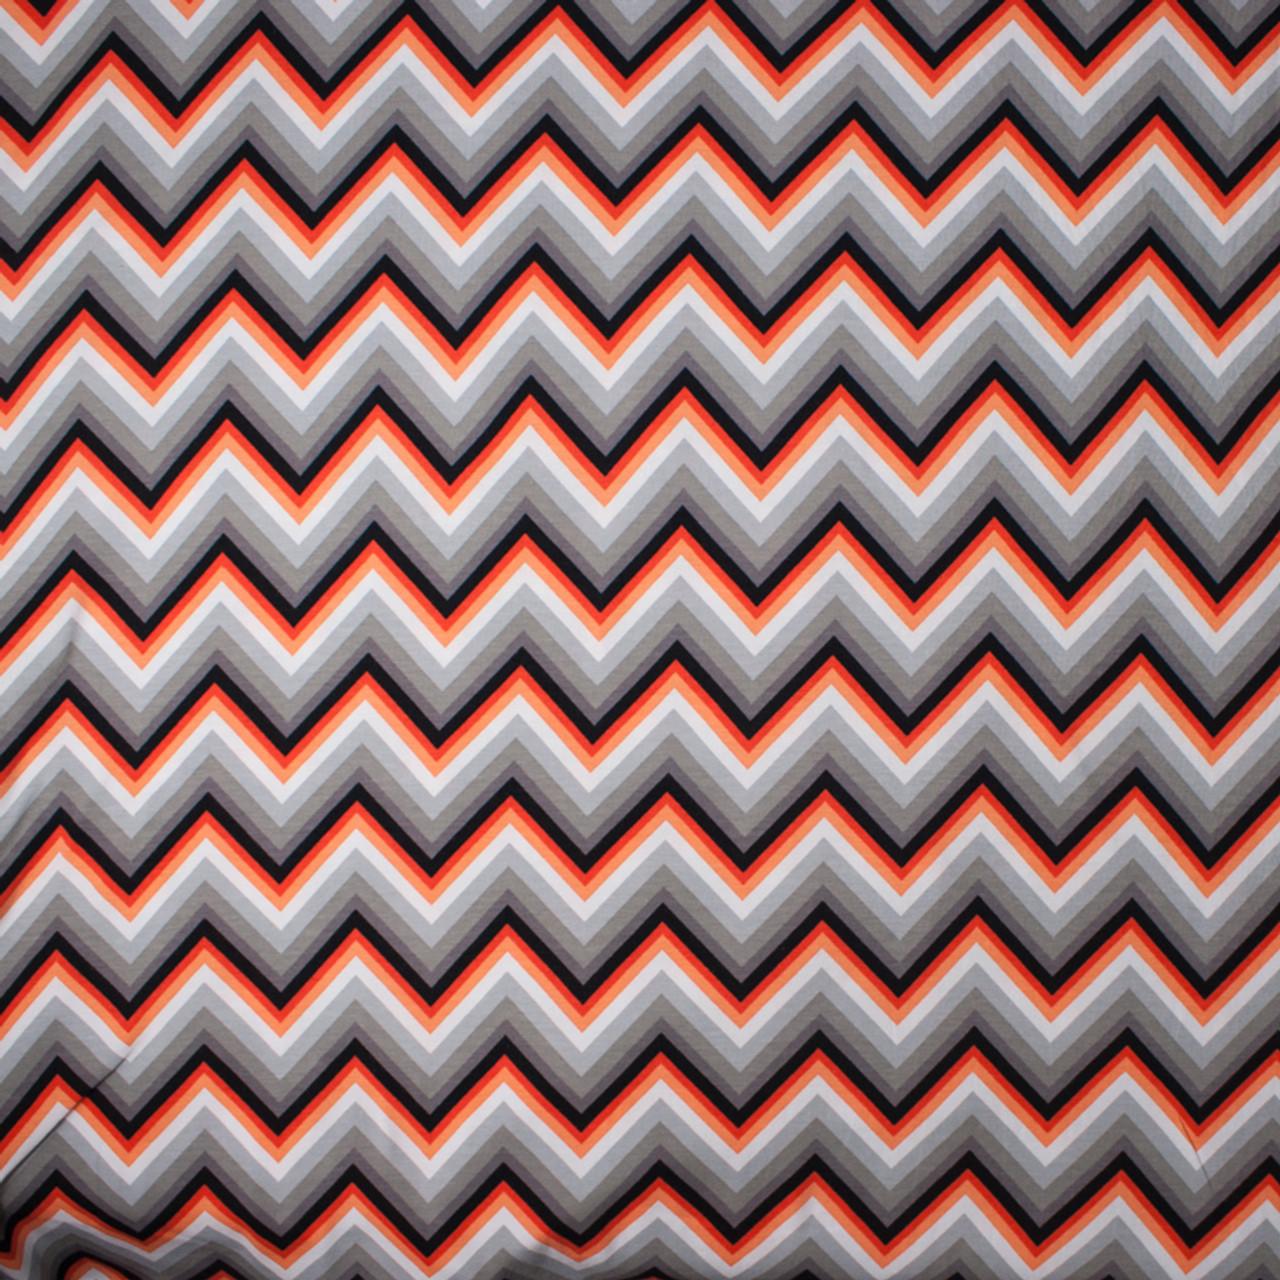 0b10b3627f4 ... Tangerine Chevron 'Laguna' Stretch Cotton/Lycra Jersey Knit by Robert  Kaufman